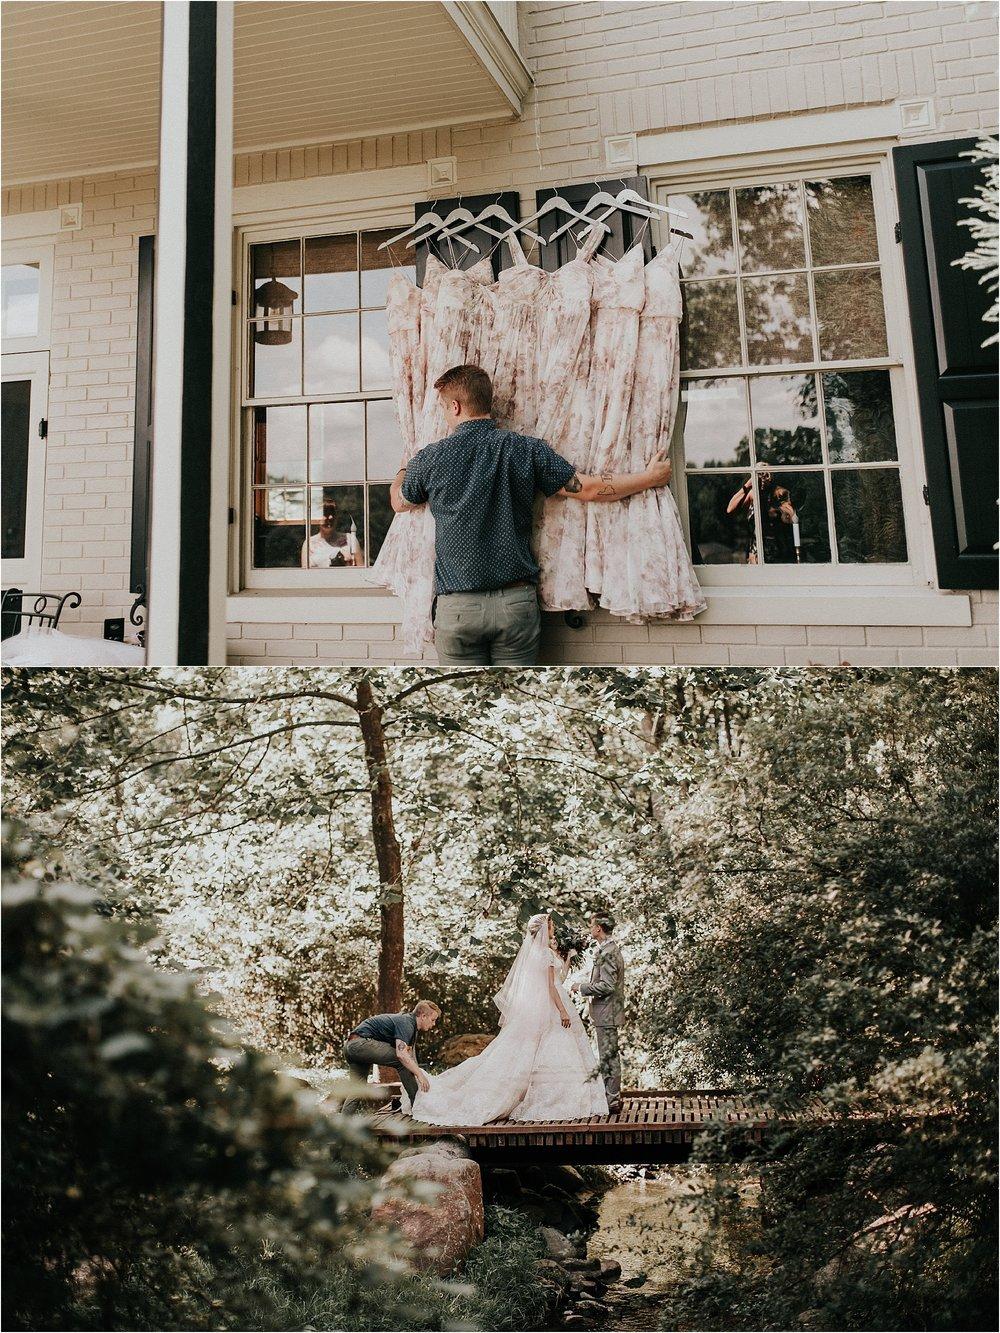 Sarah_Brookhart_PA_MD_Wedding_Photographer_0004.jpg